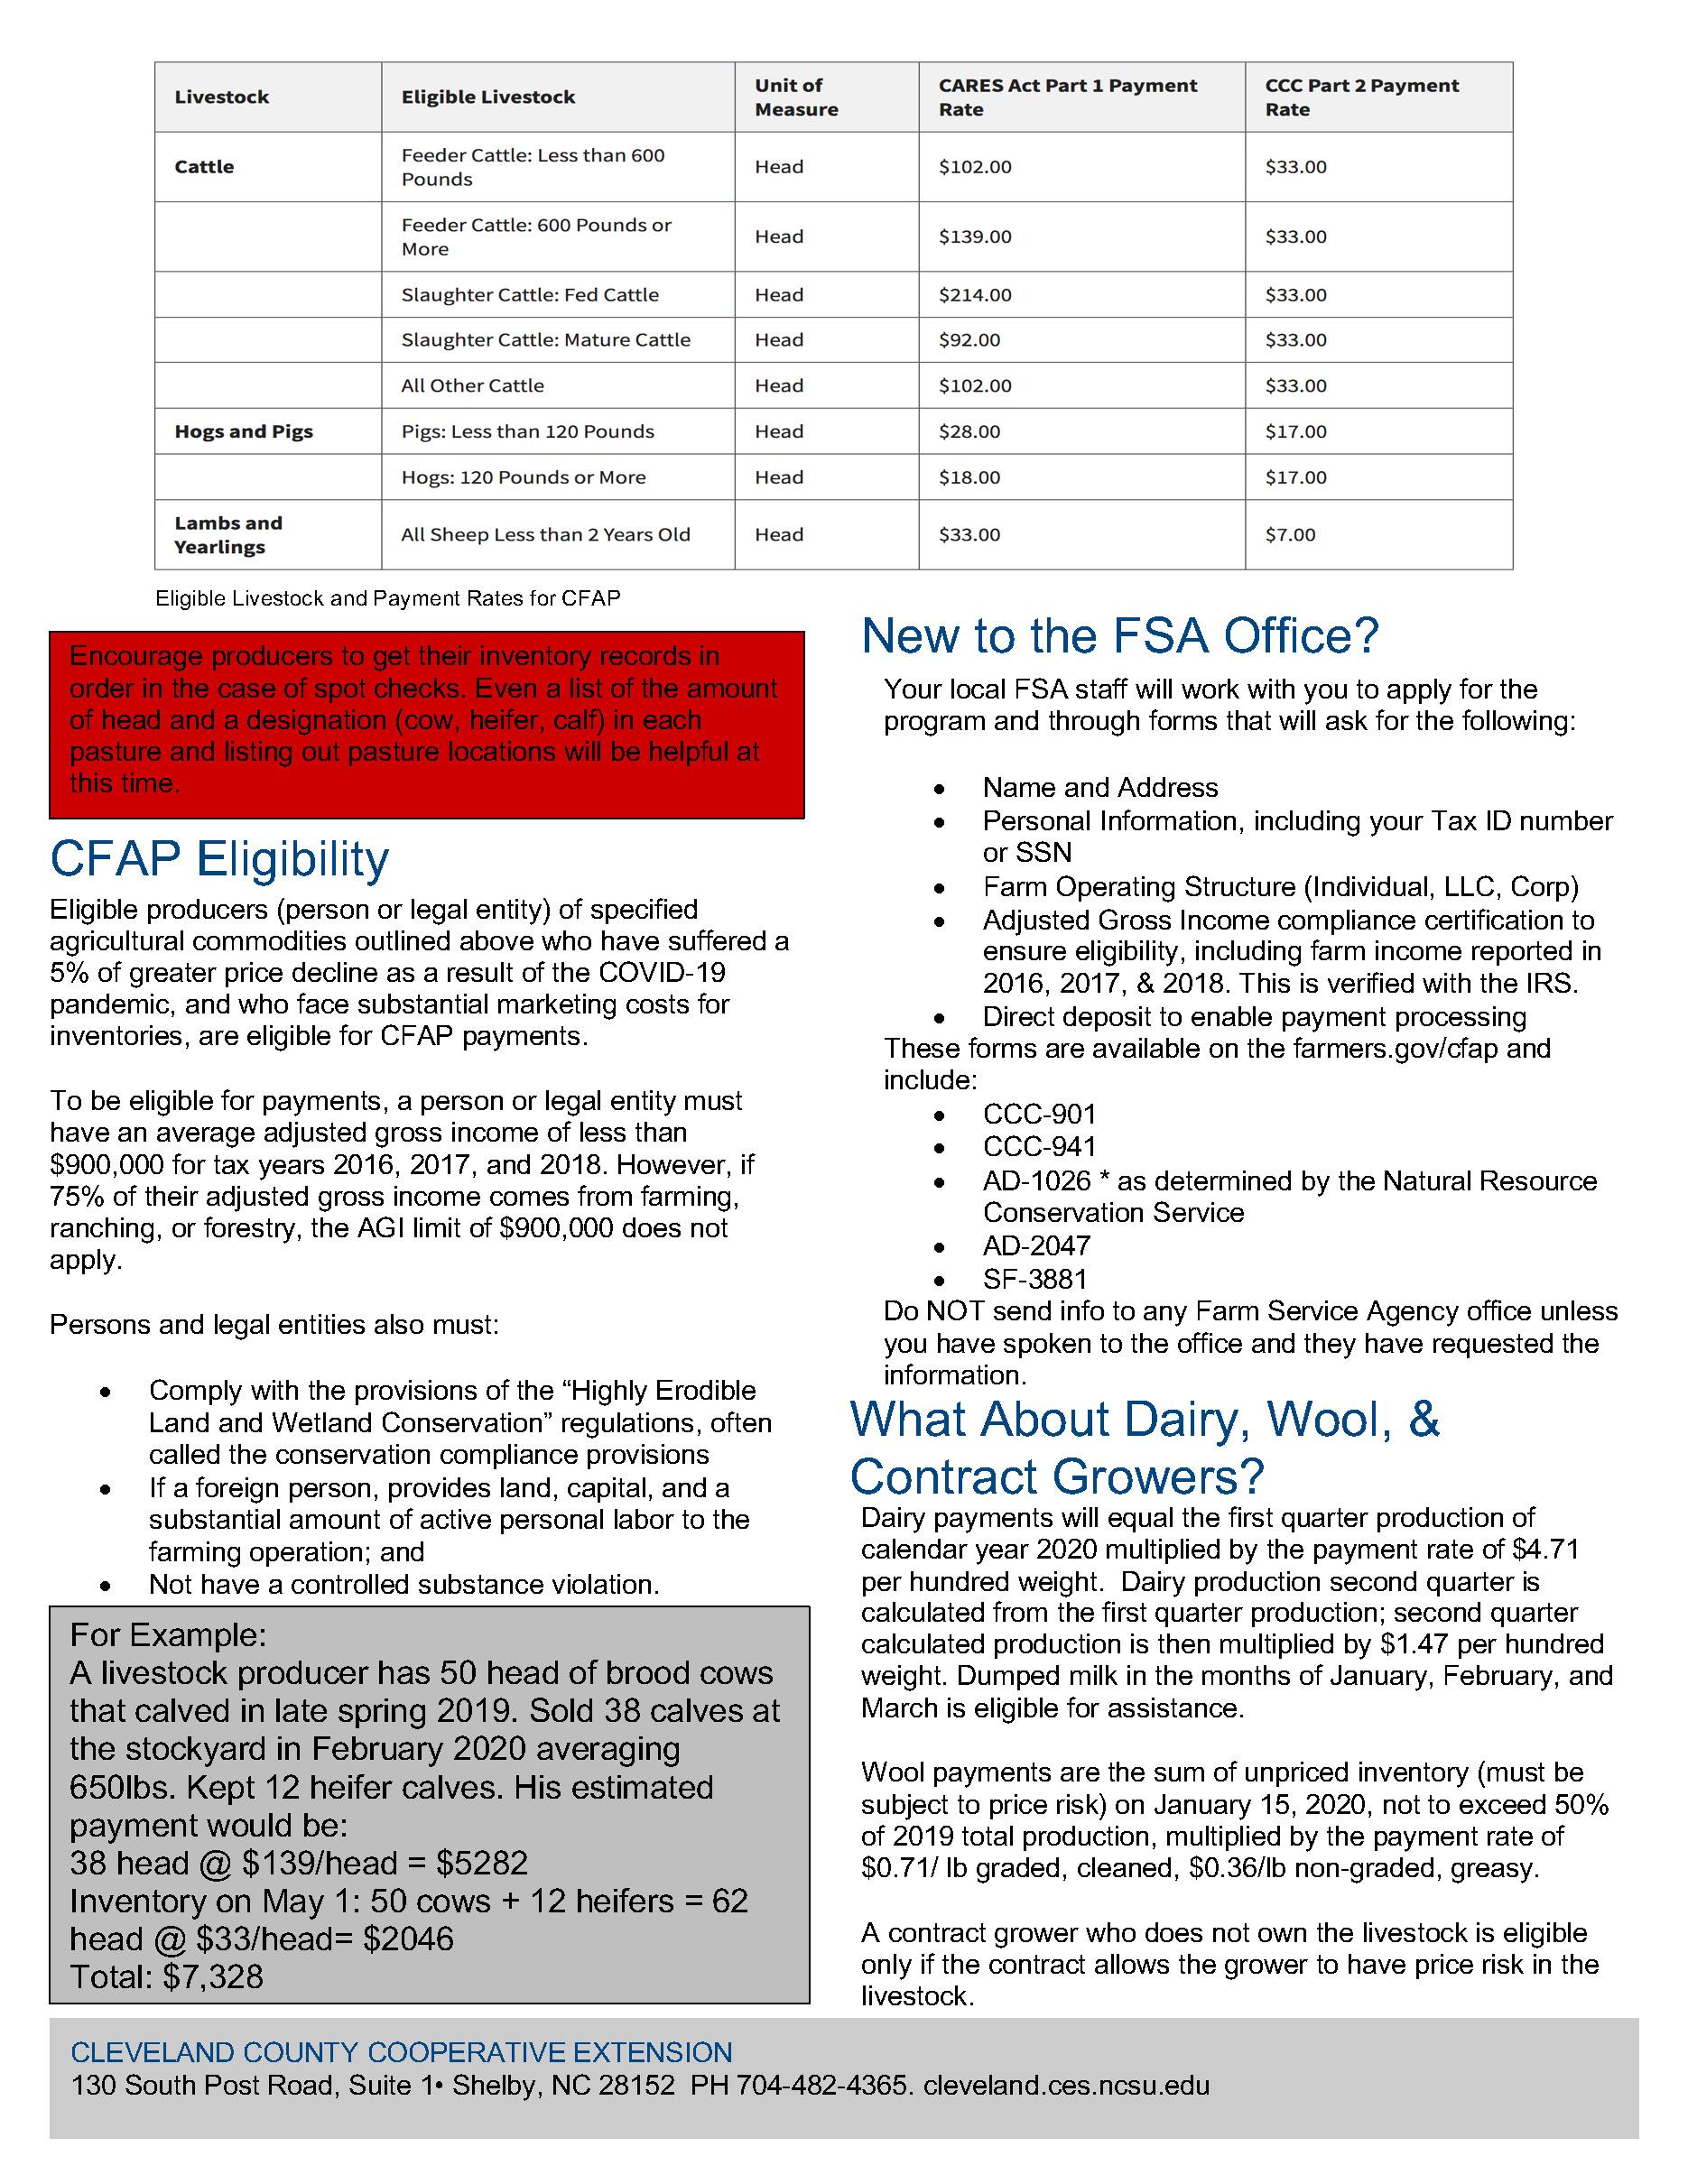 CFAP 2